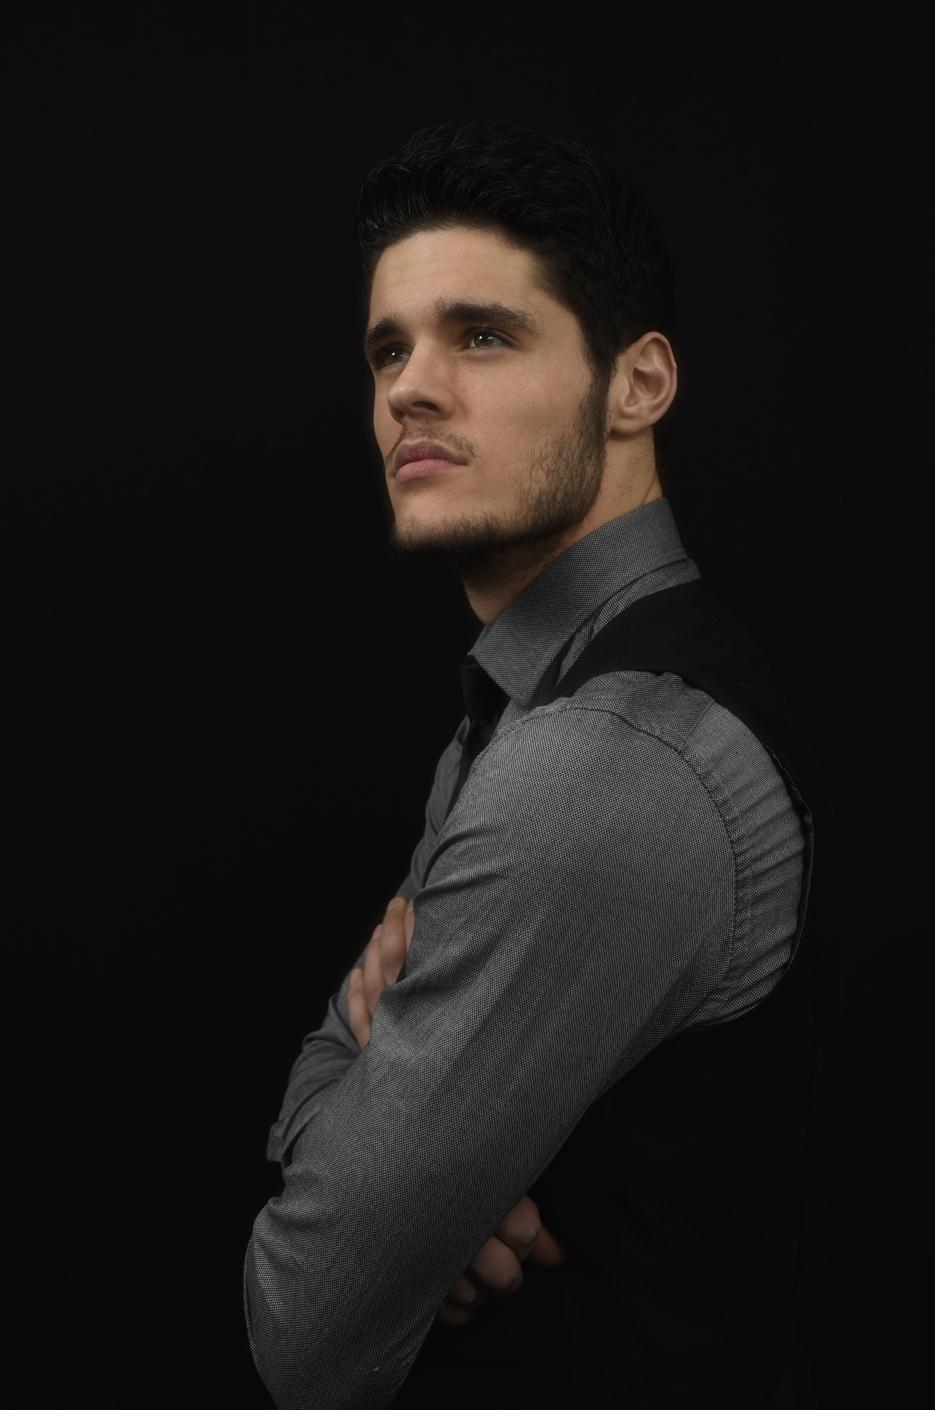 Portrait-155.jpg